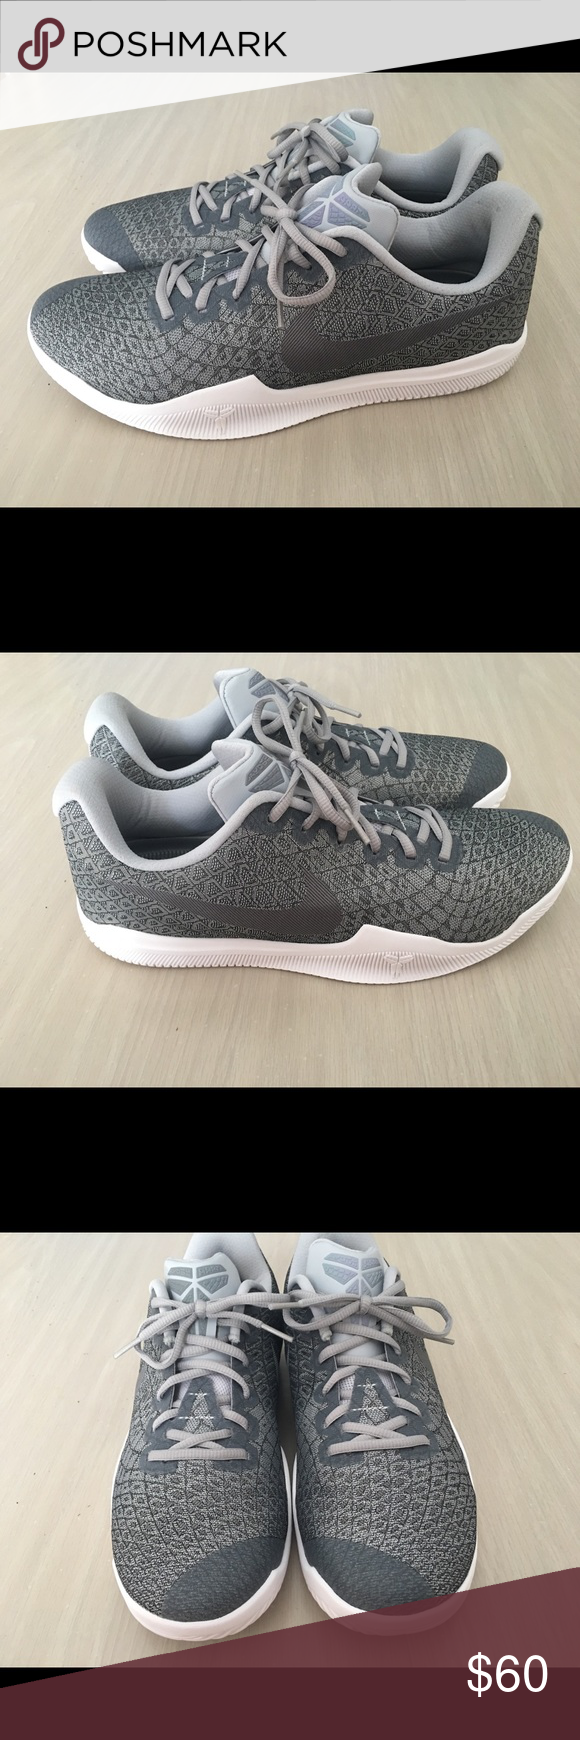 bcf1052e1864 Nike Kobe Mamba Instinct Pure Platinum Cool Grey Nike Kobe Mamba Instinct  Pure Platinum White Cool Grey 852473-002 Men s Size 11 These are brand new  without ...